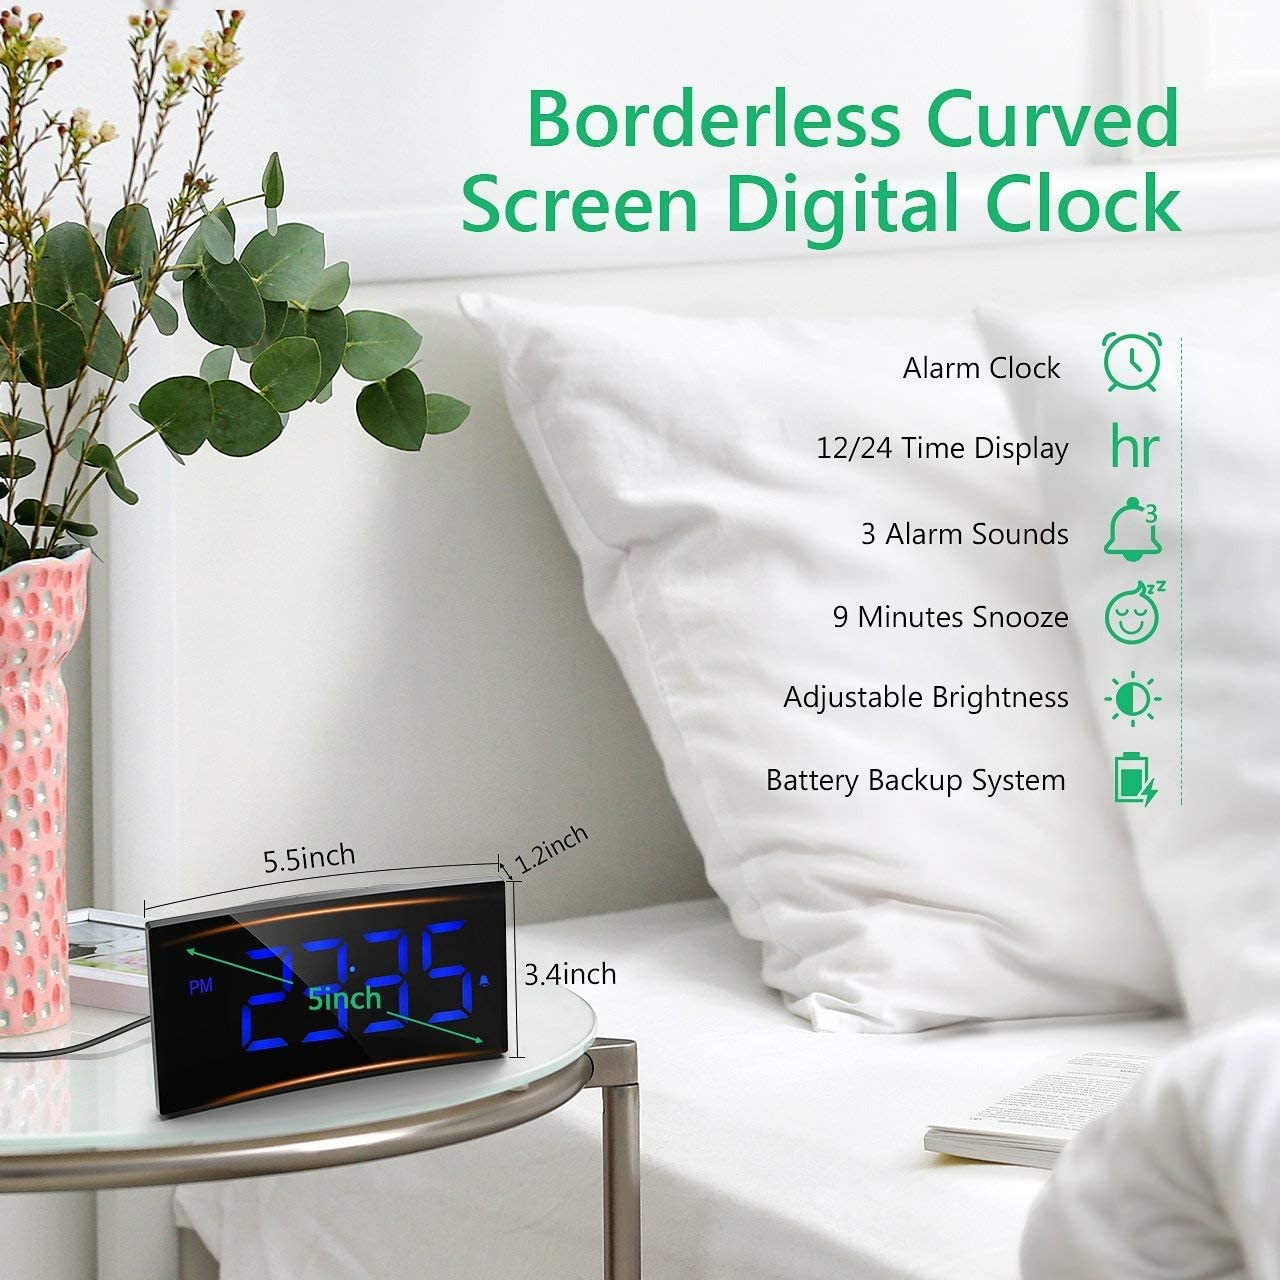 PICTEK Digital Alarm Clock, Bedside Clock with 5 Curved Screen, 6 Brightness Dimmer, Big Digital Display, Snooze, 12 24 Hour, Mains Powered, Alarm Clock for Bedroom Office